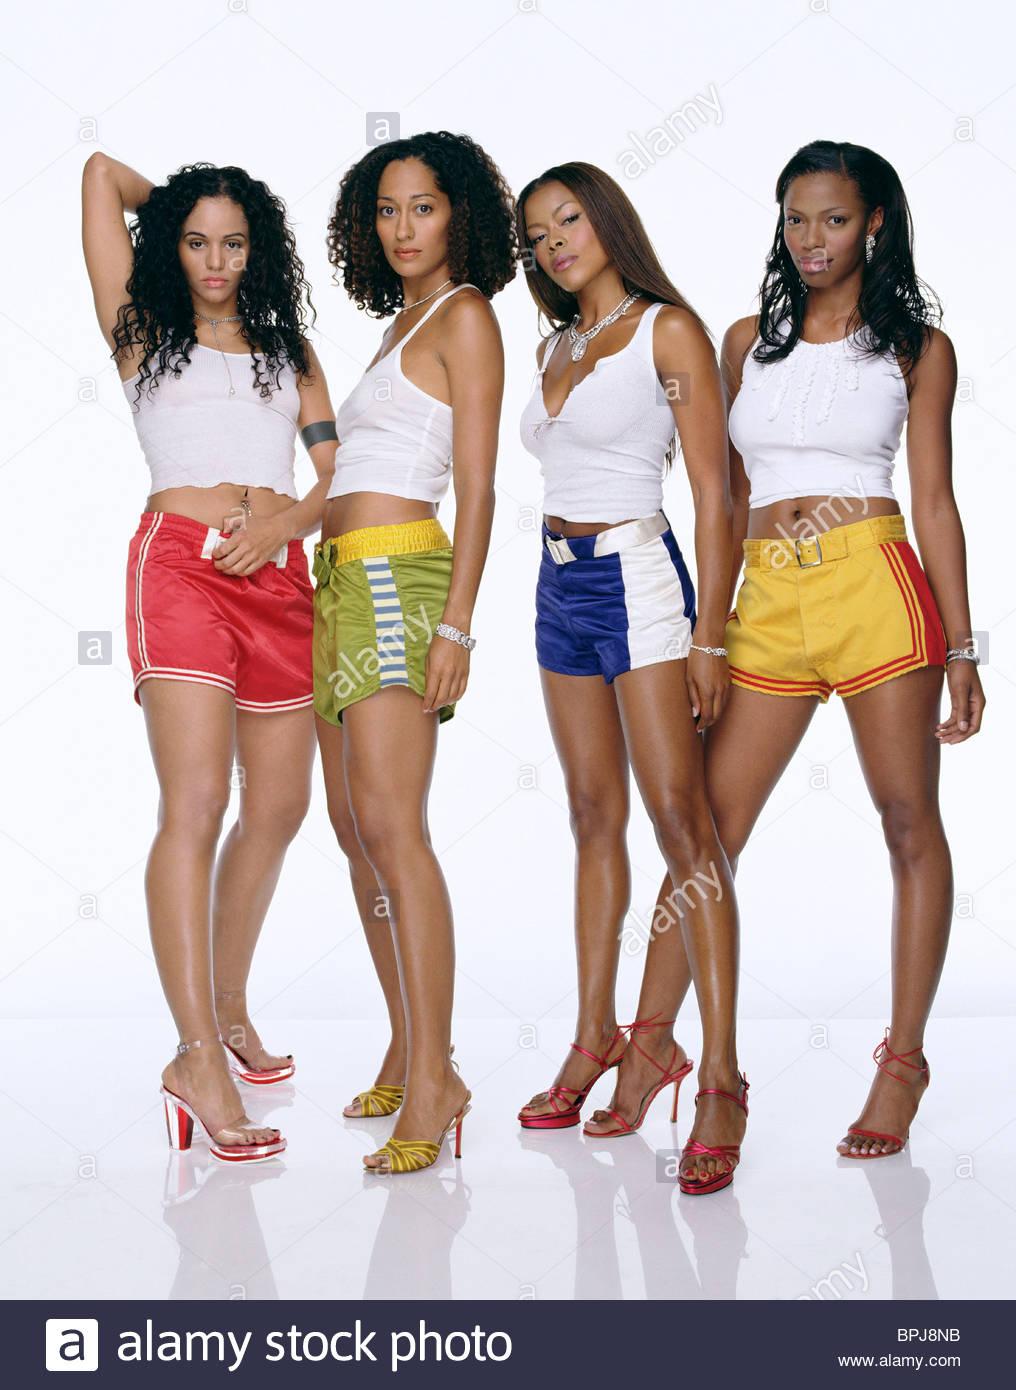 PERSIA WHITE, TRACEE ELLIS ROSS, JILL MARIE JONES, GOLDEN BROOKS, GIRLFRIENDS : SEASON 3, 2002 Stock Photo